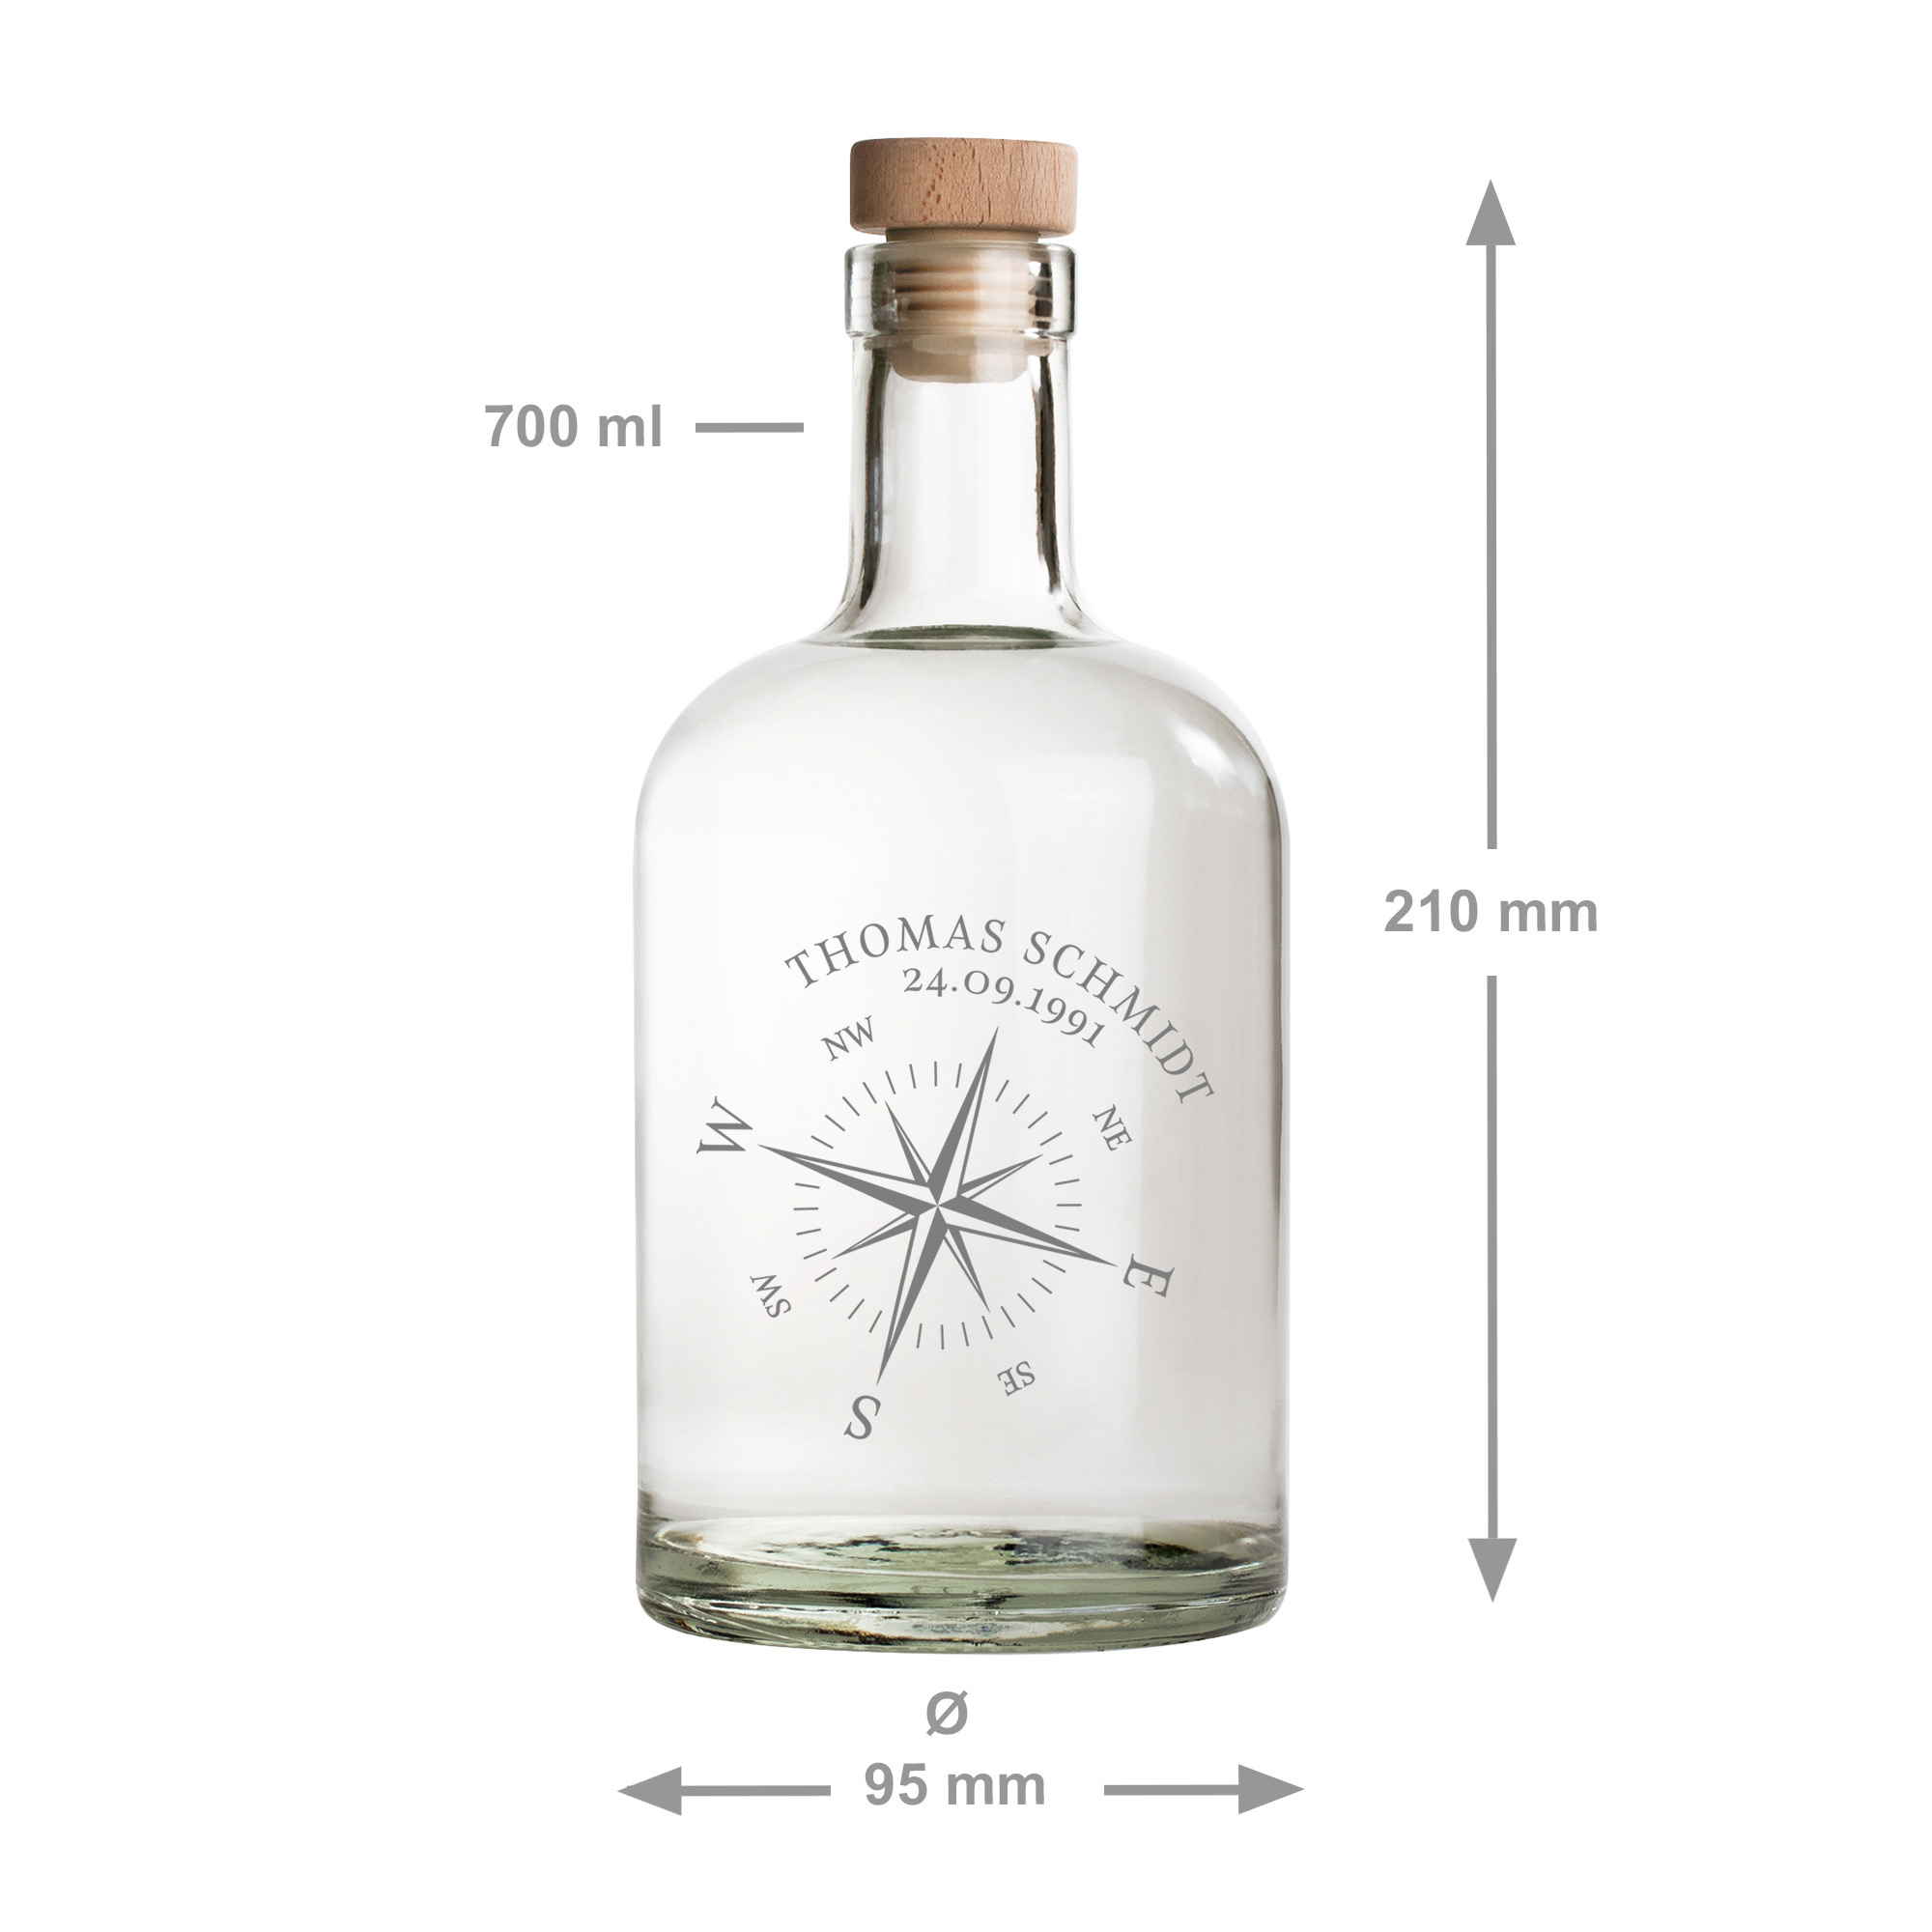 Glaskaraffe mit Gravur - Kompass - Personalisiert